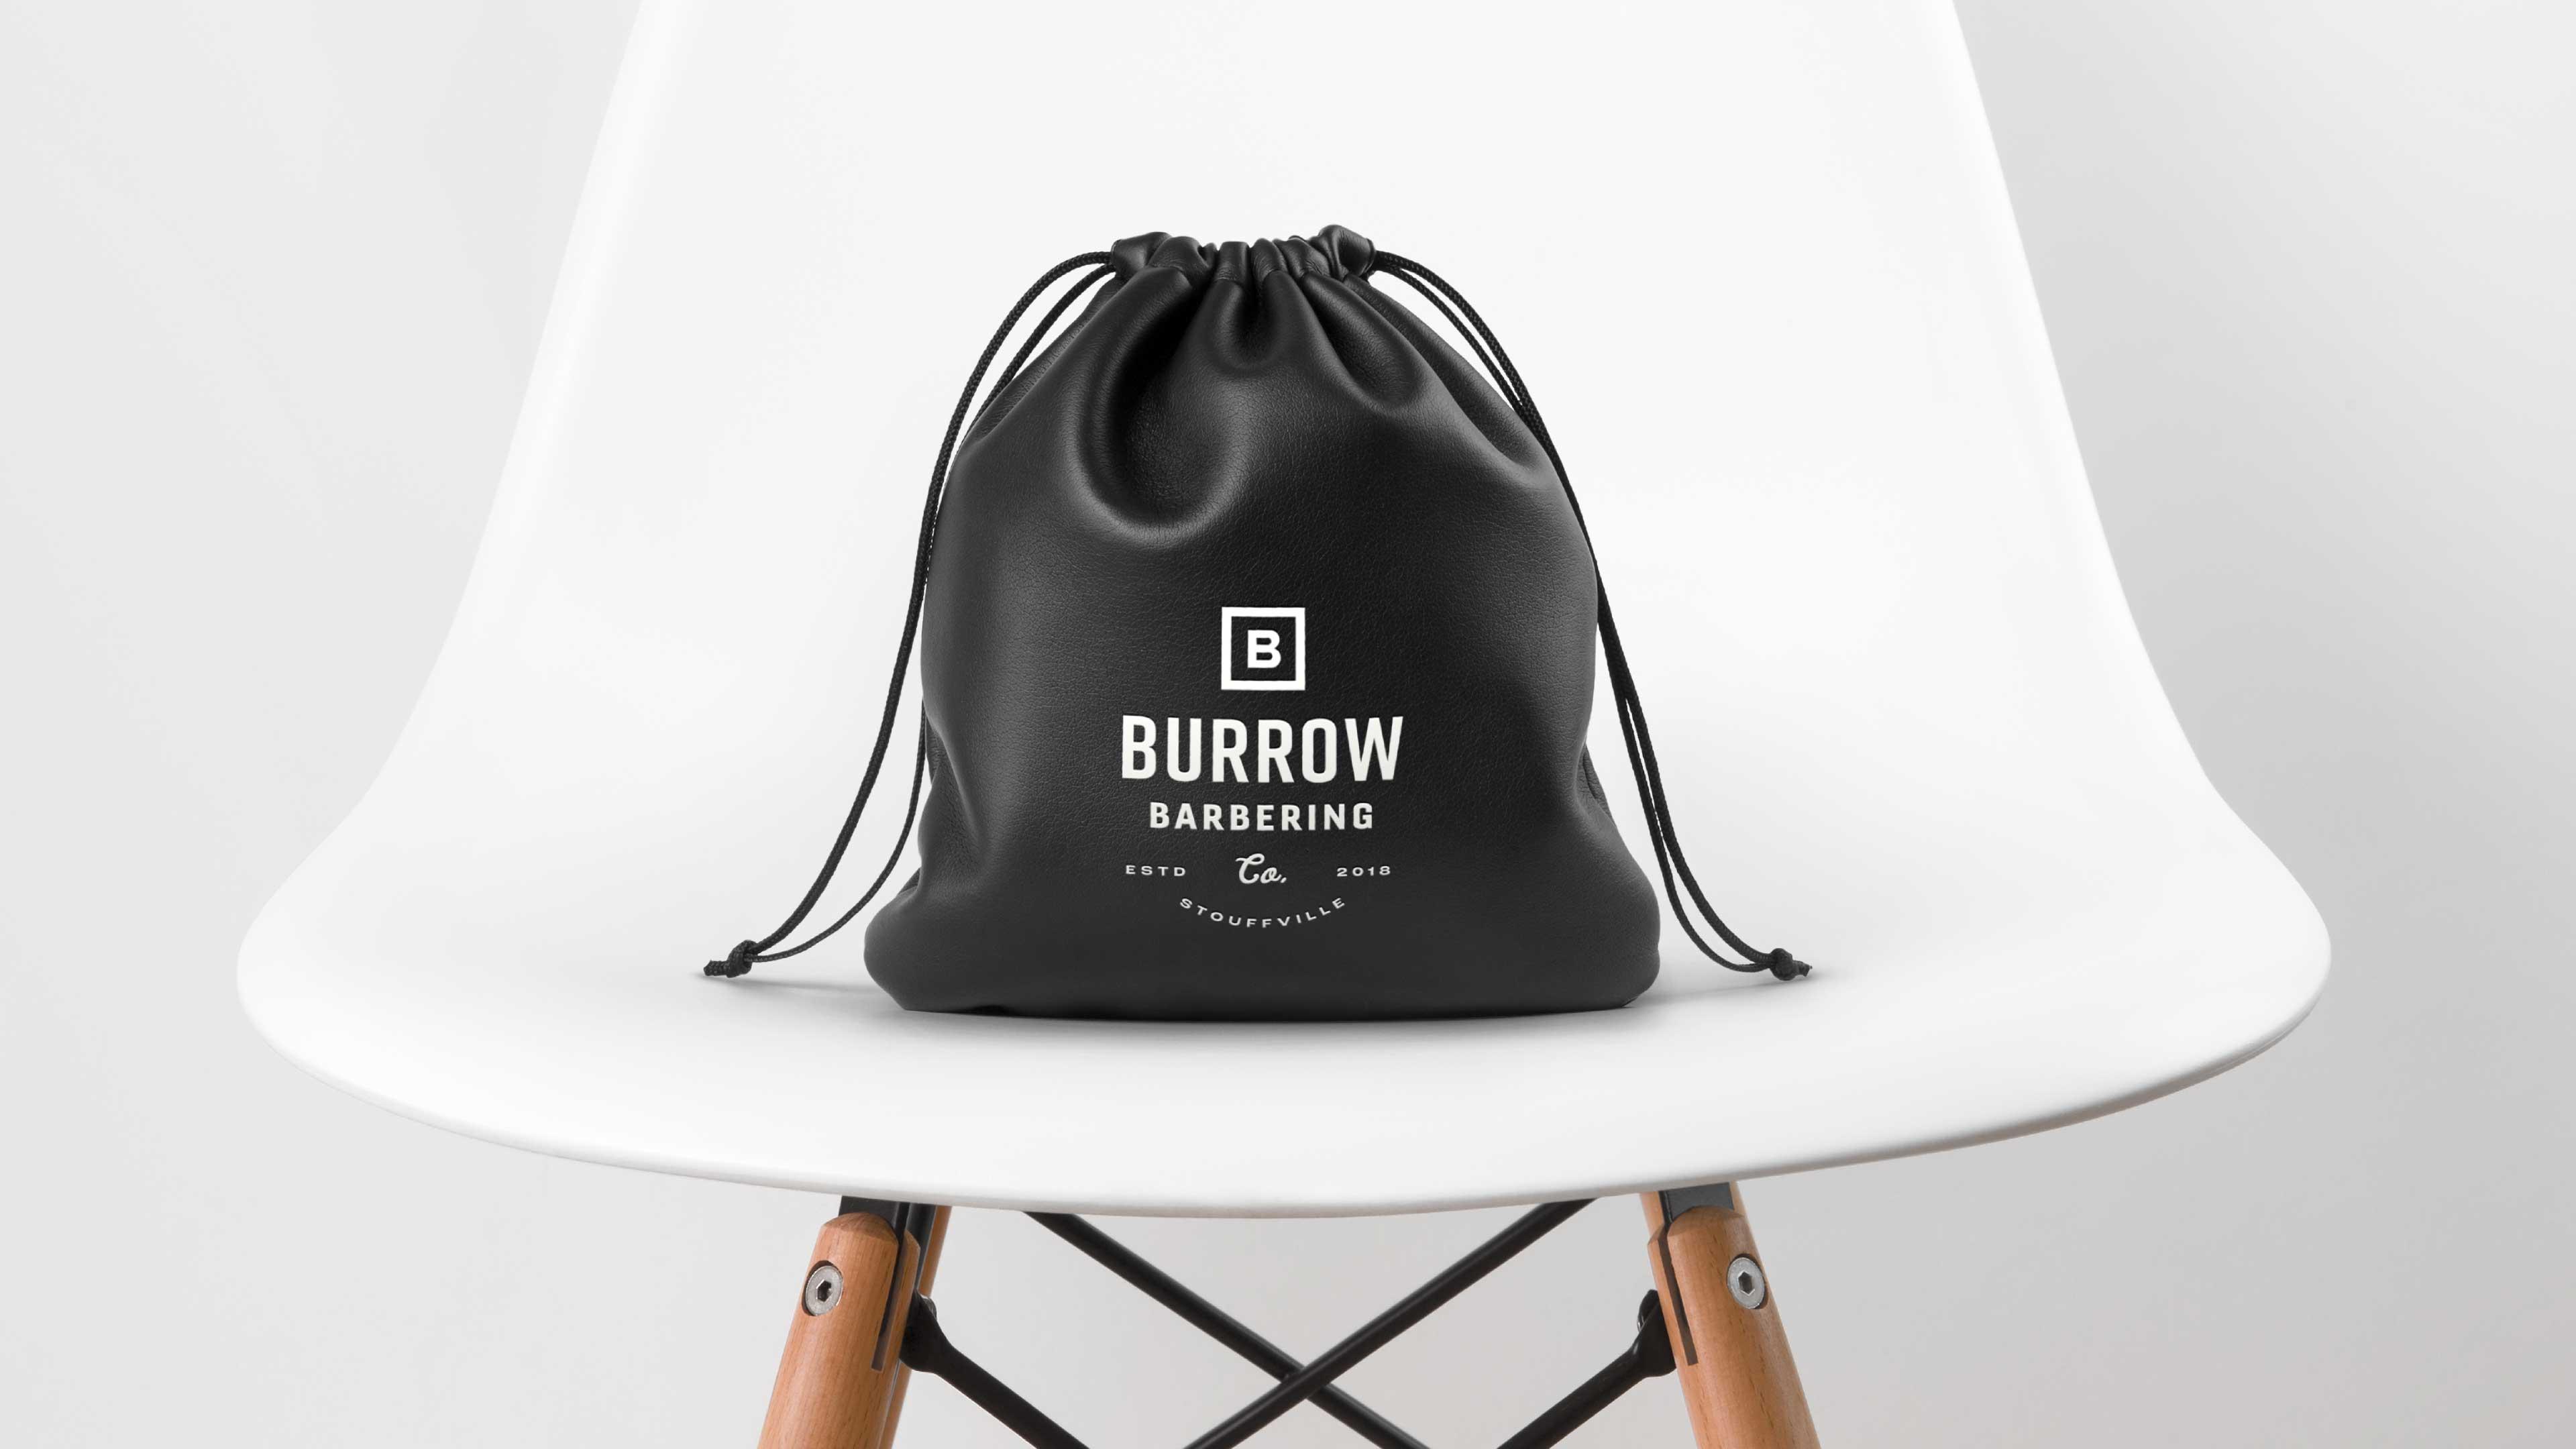 burrow-barbering-co-inthewild-e